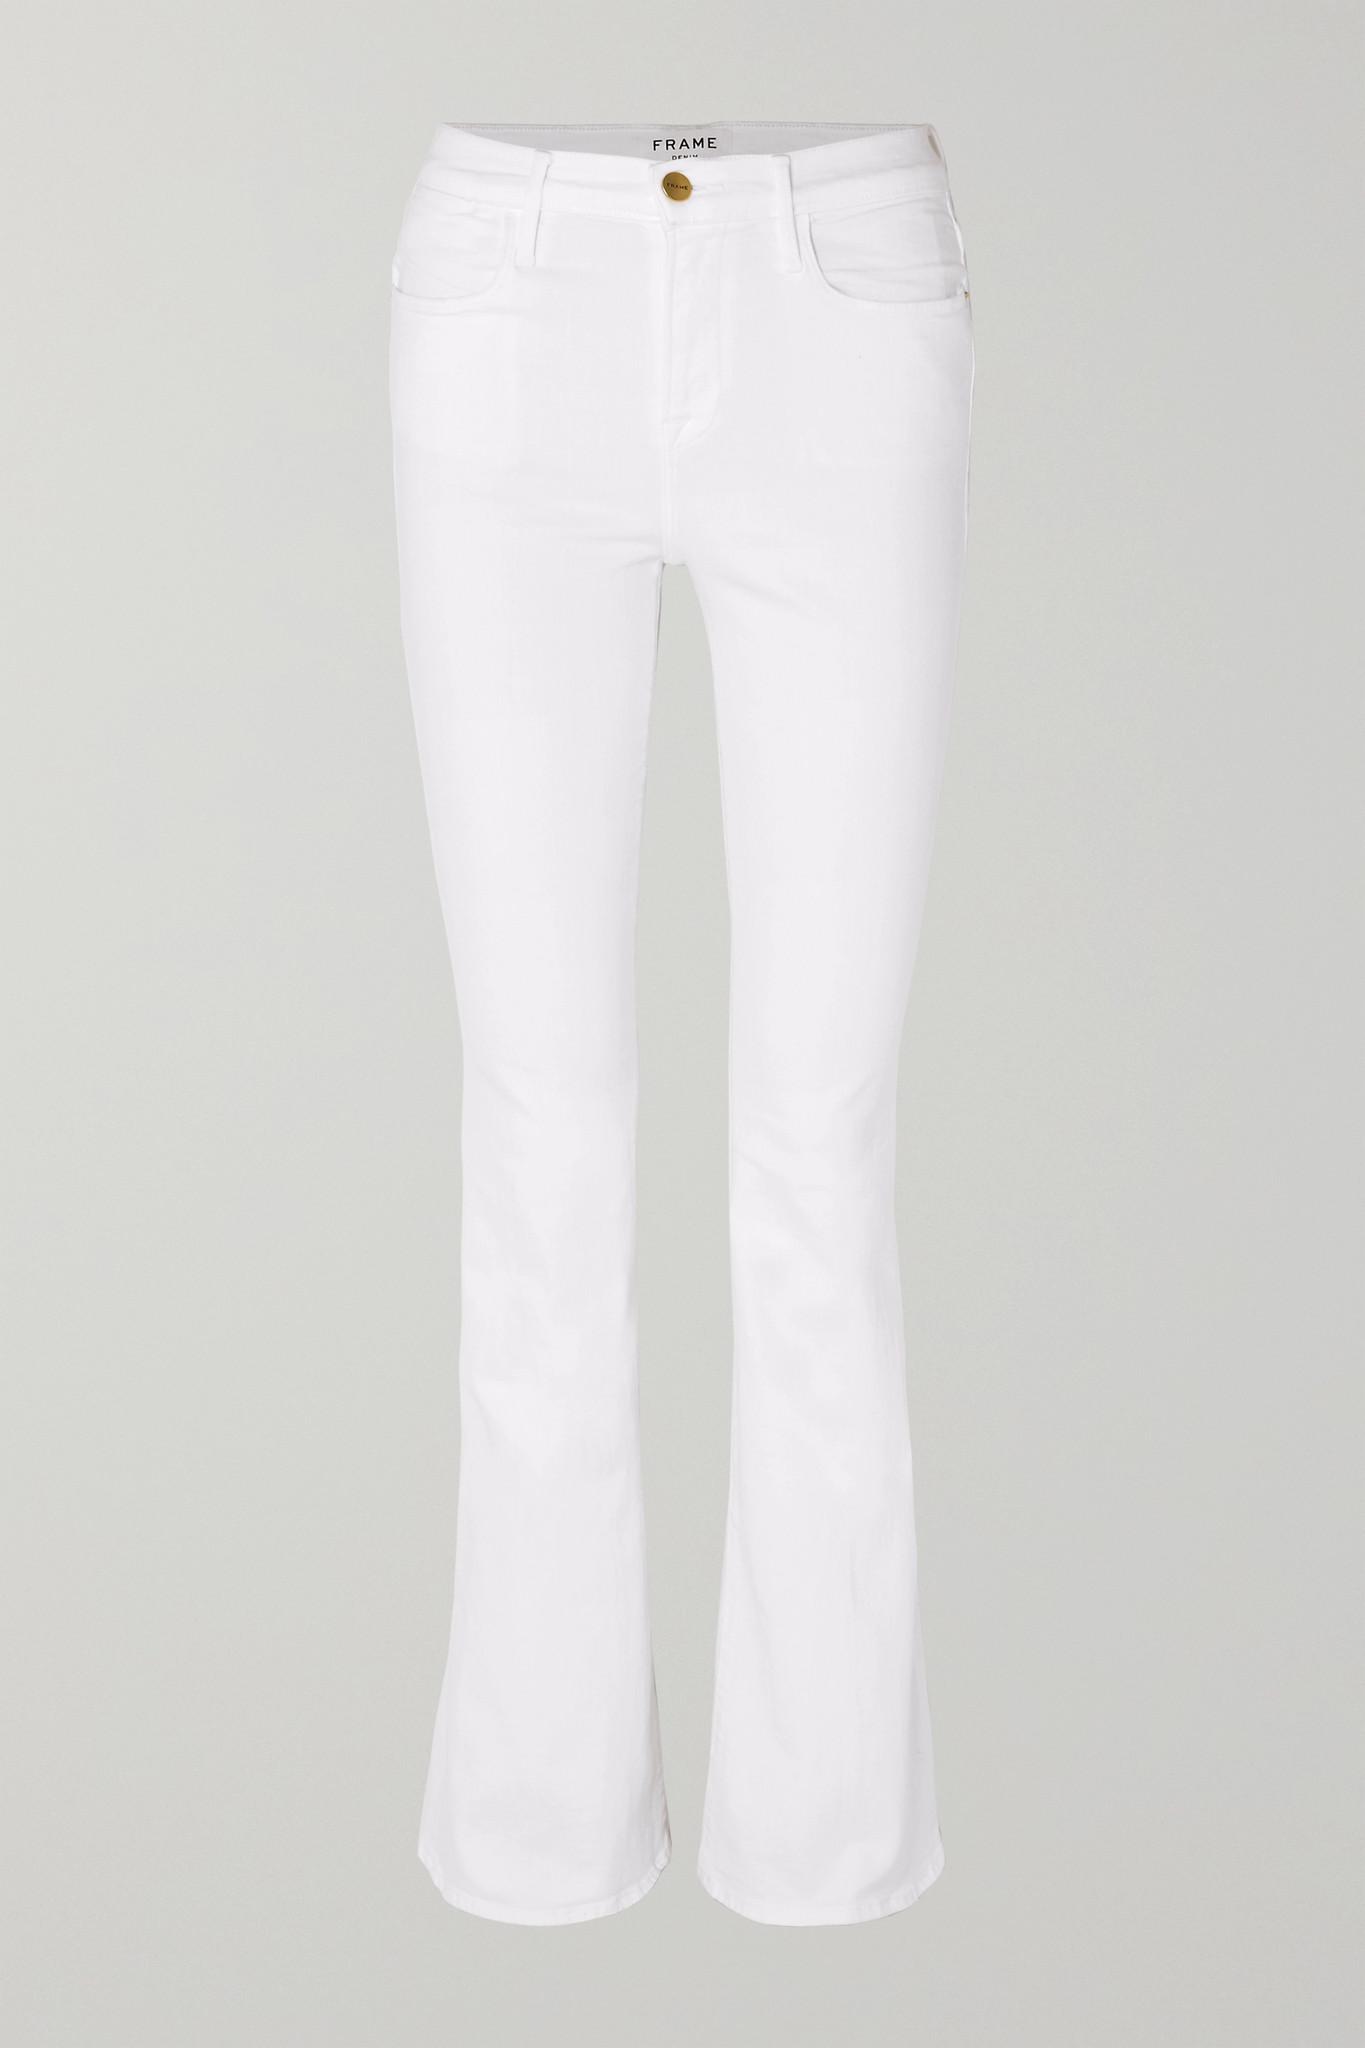 FRAME - Le High Flare 牛仔裤 - 白色 - 33